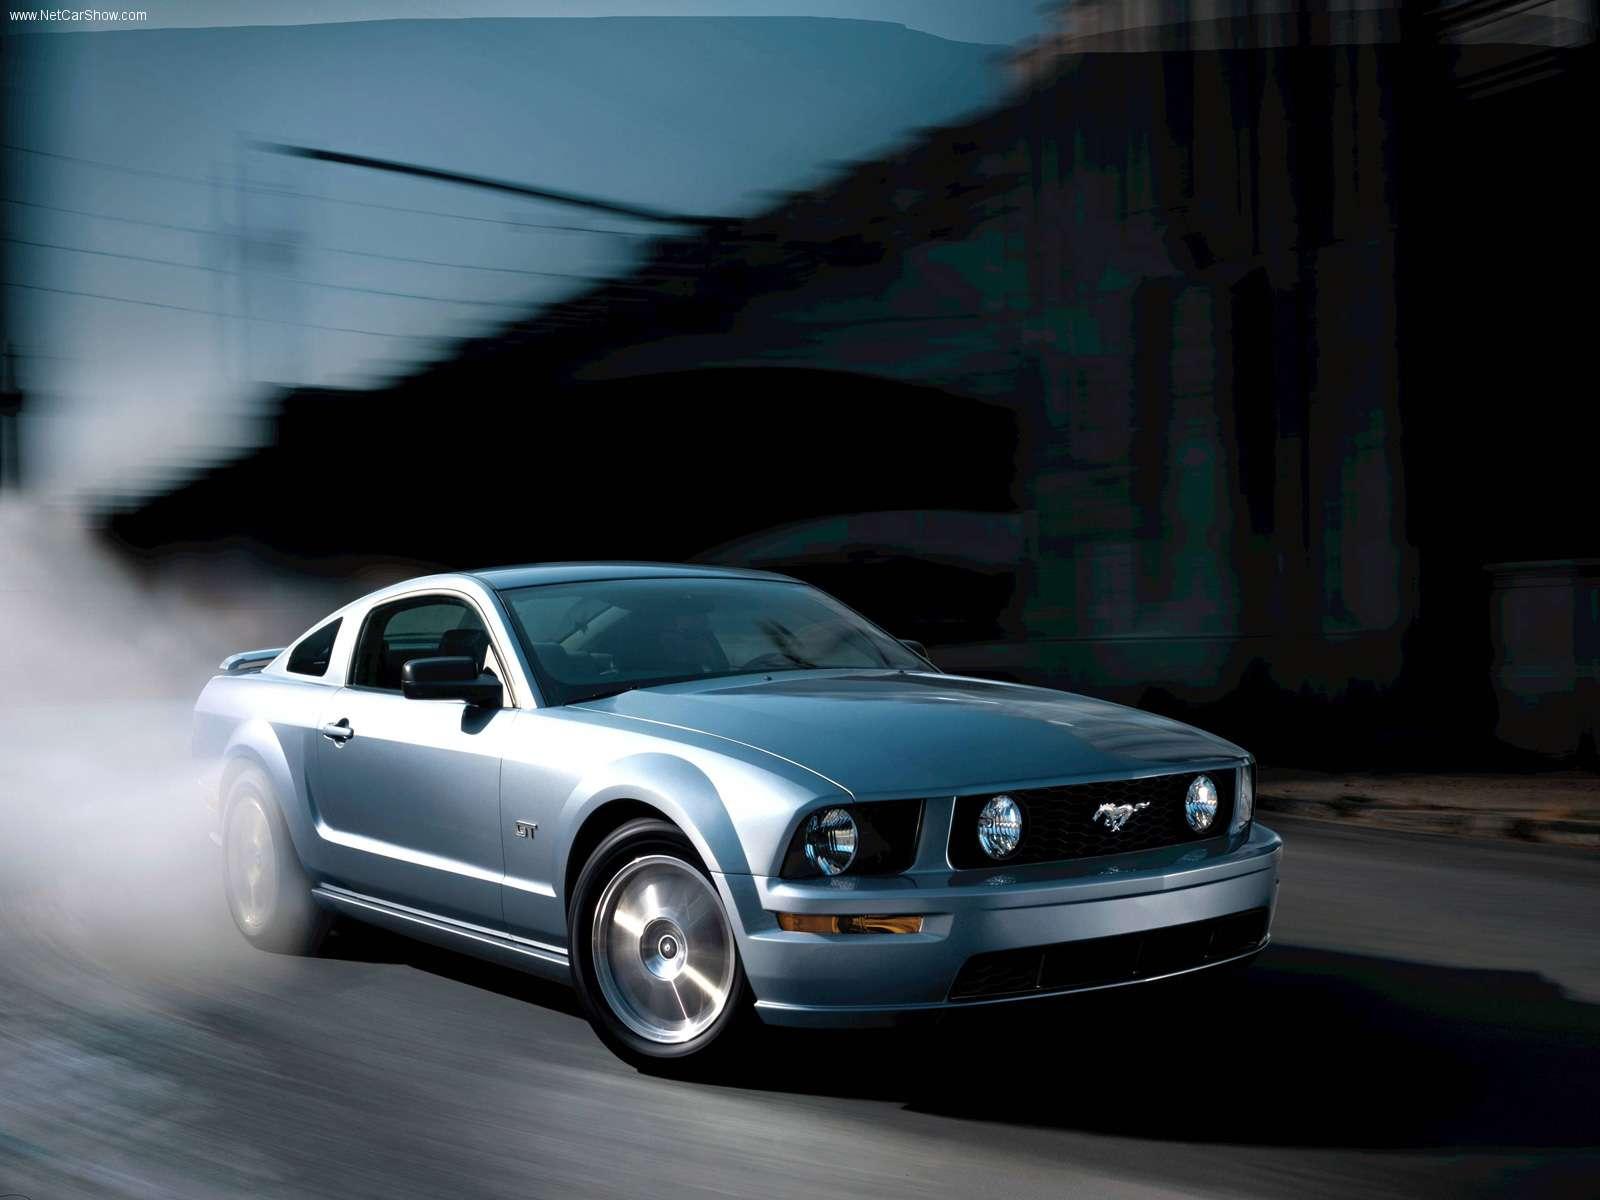 Mustang GT Luxury Car Wallpaper 1600x1200